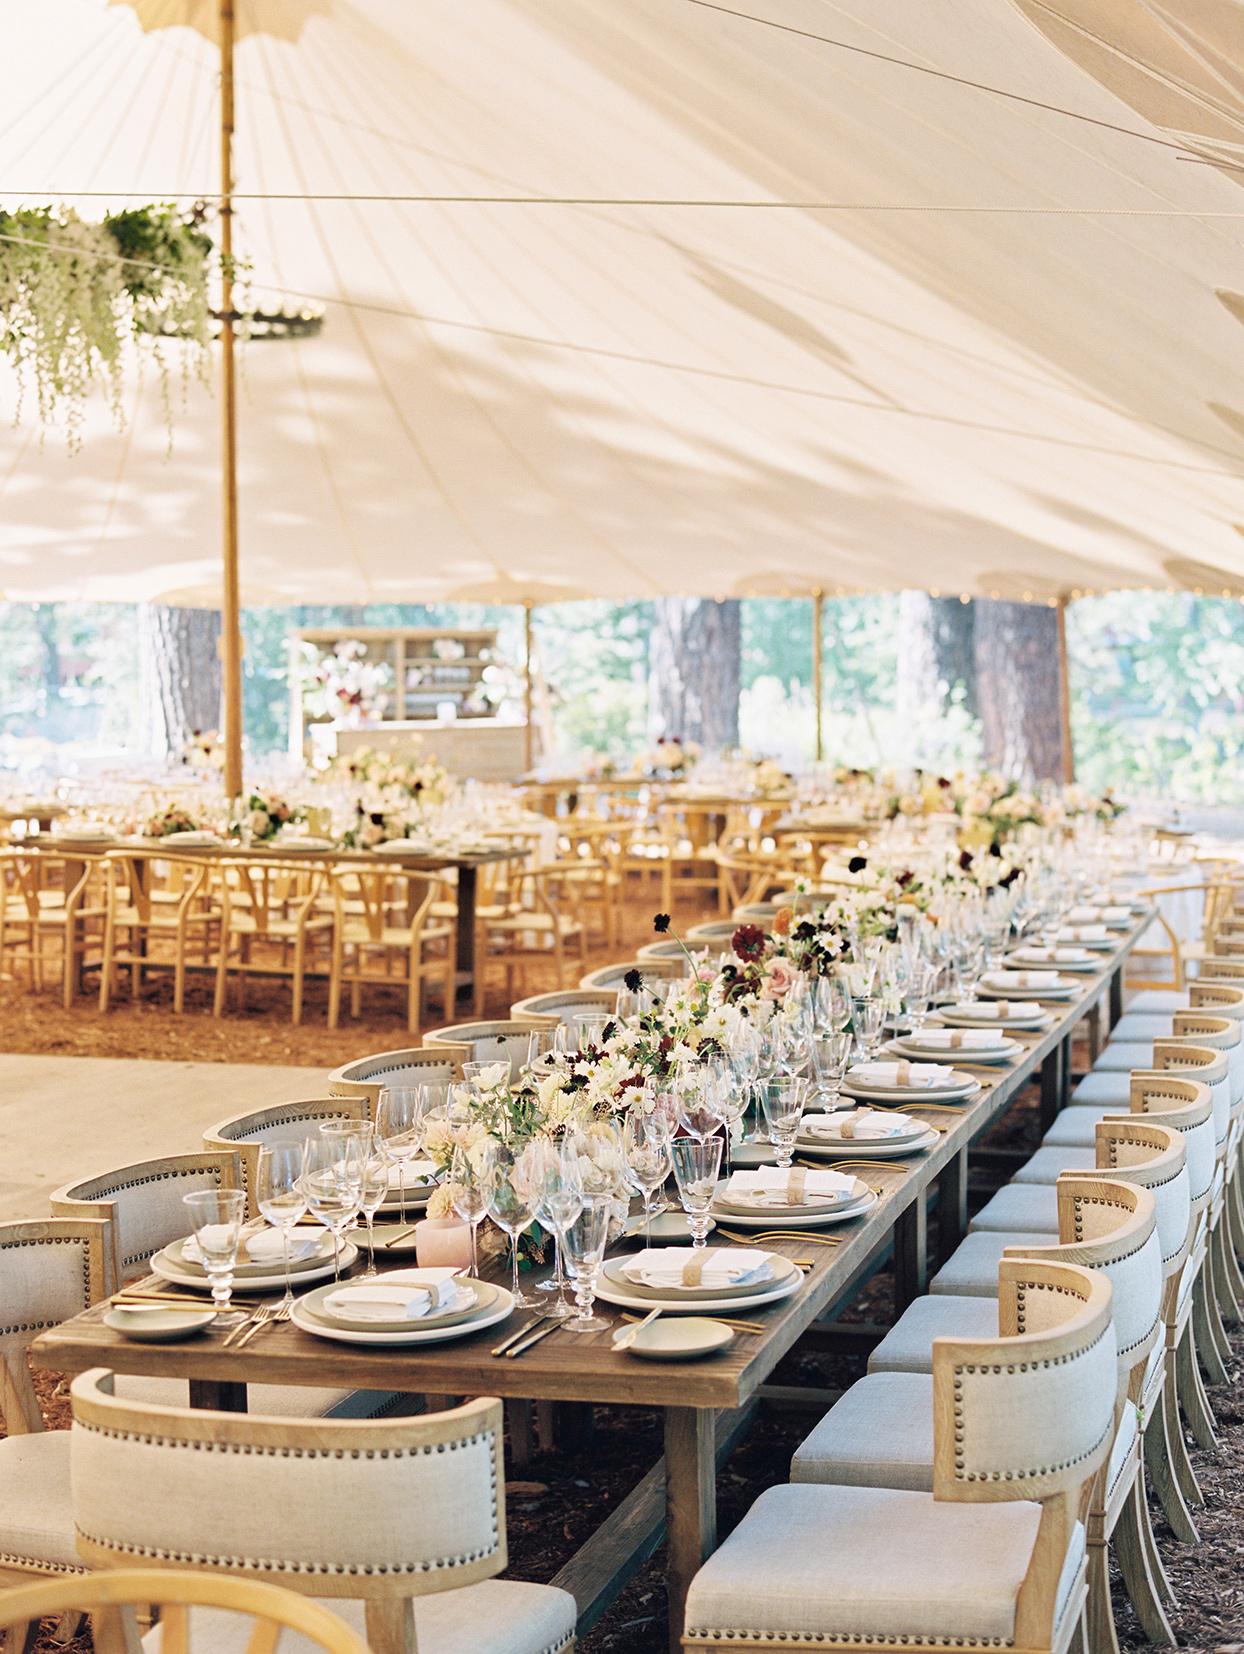 elegant long tables under tent at wedding reception